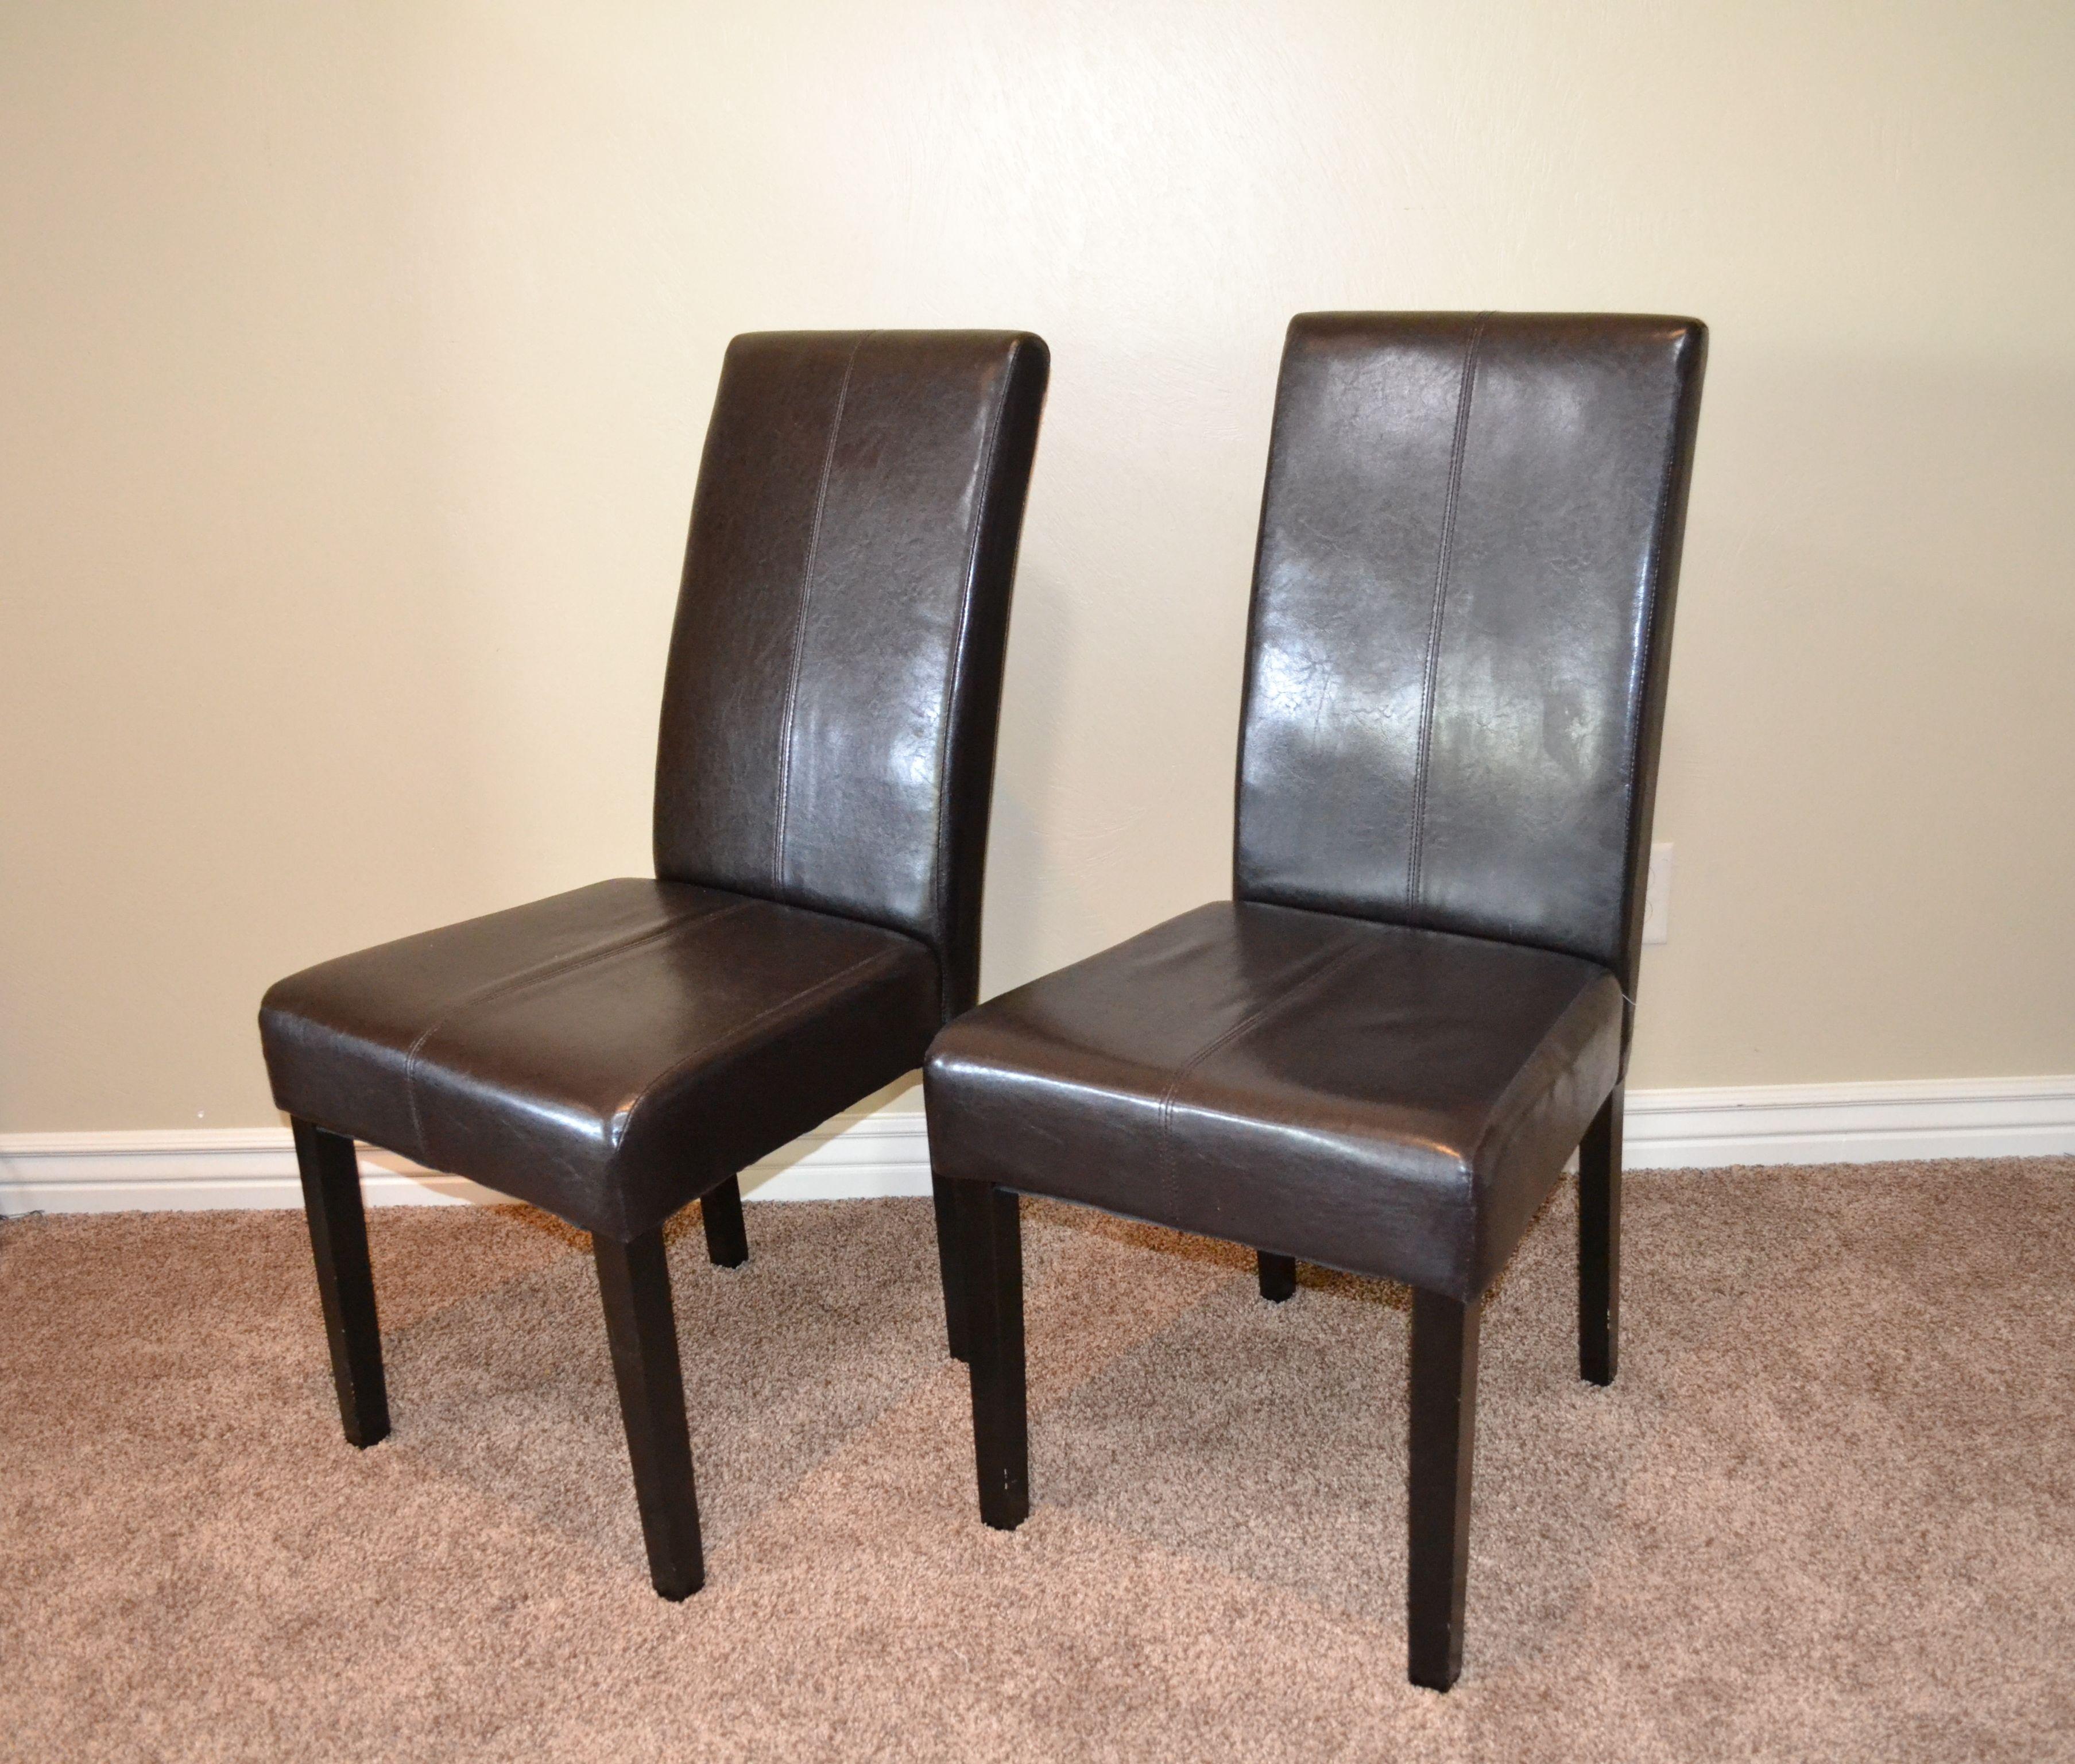 Parson Chair Chevron Slip Cover Tutorial | I Am Hardware